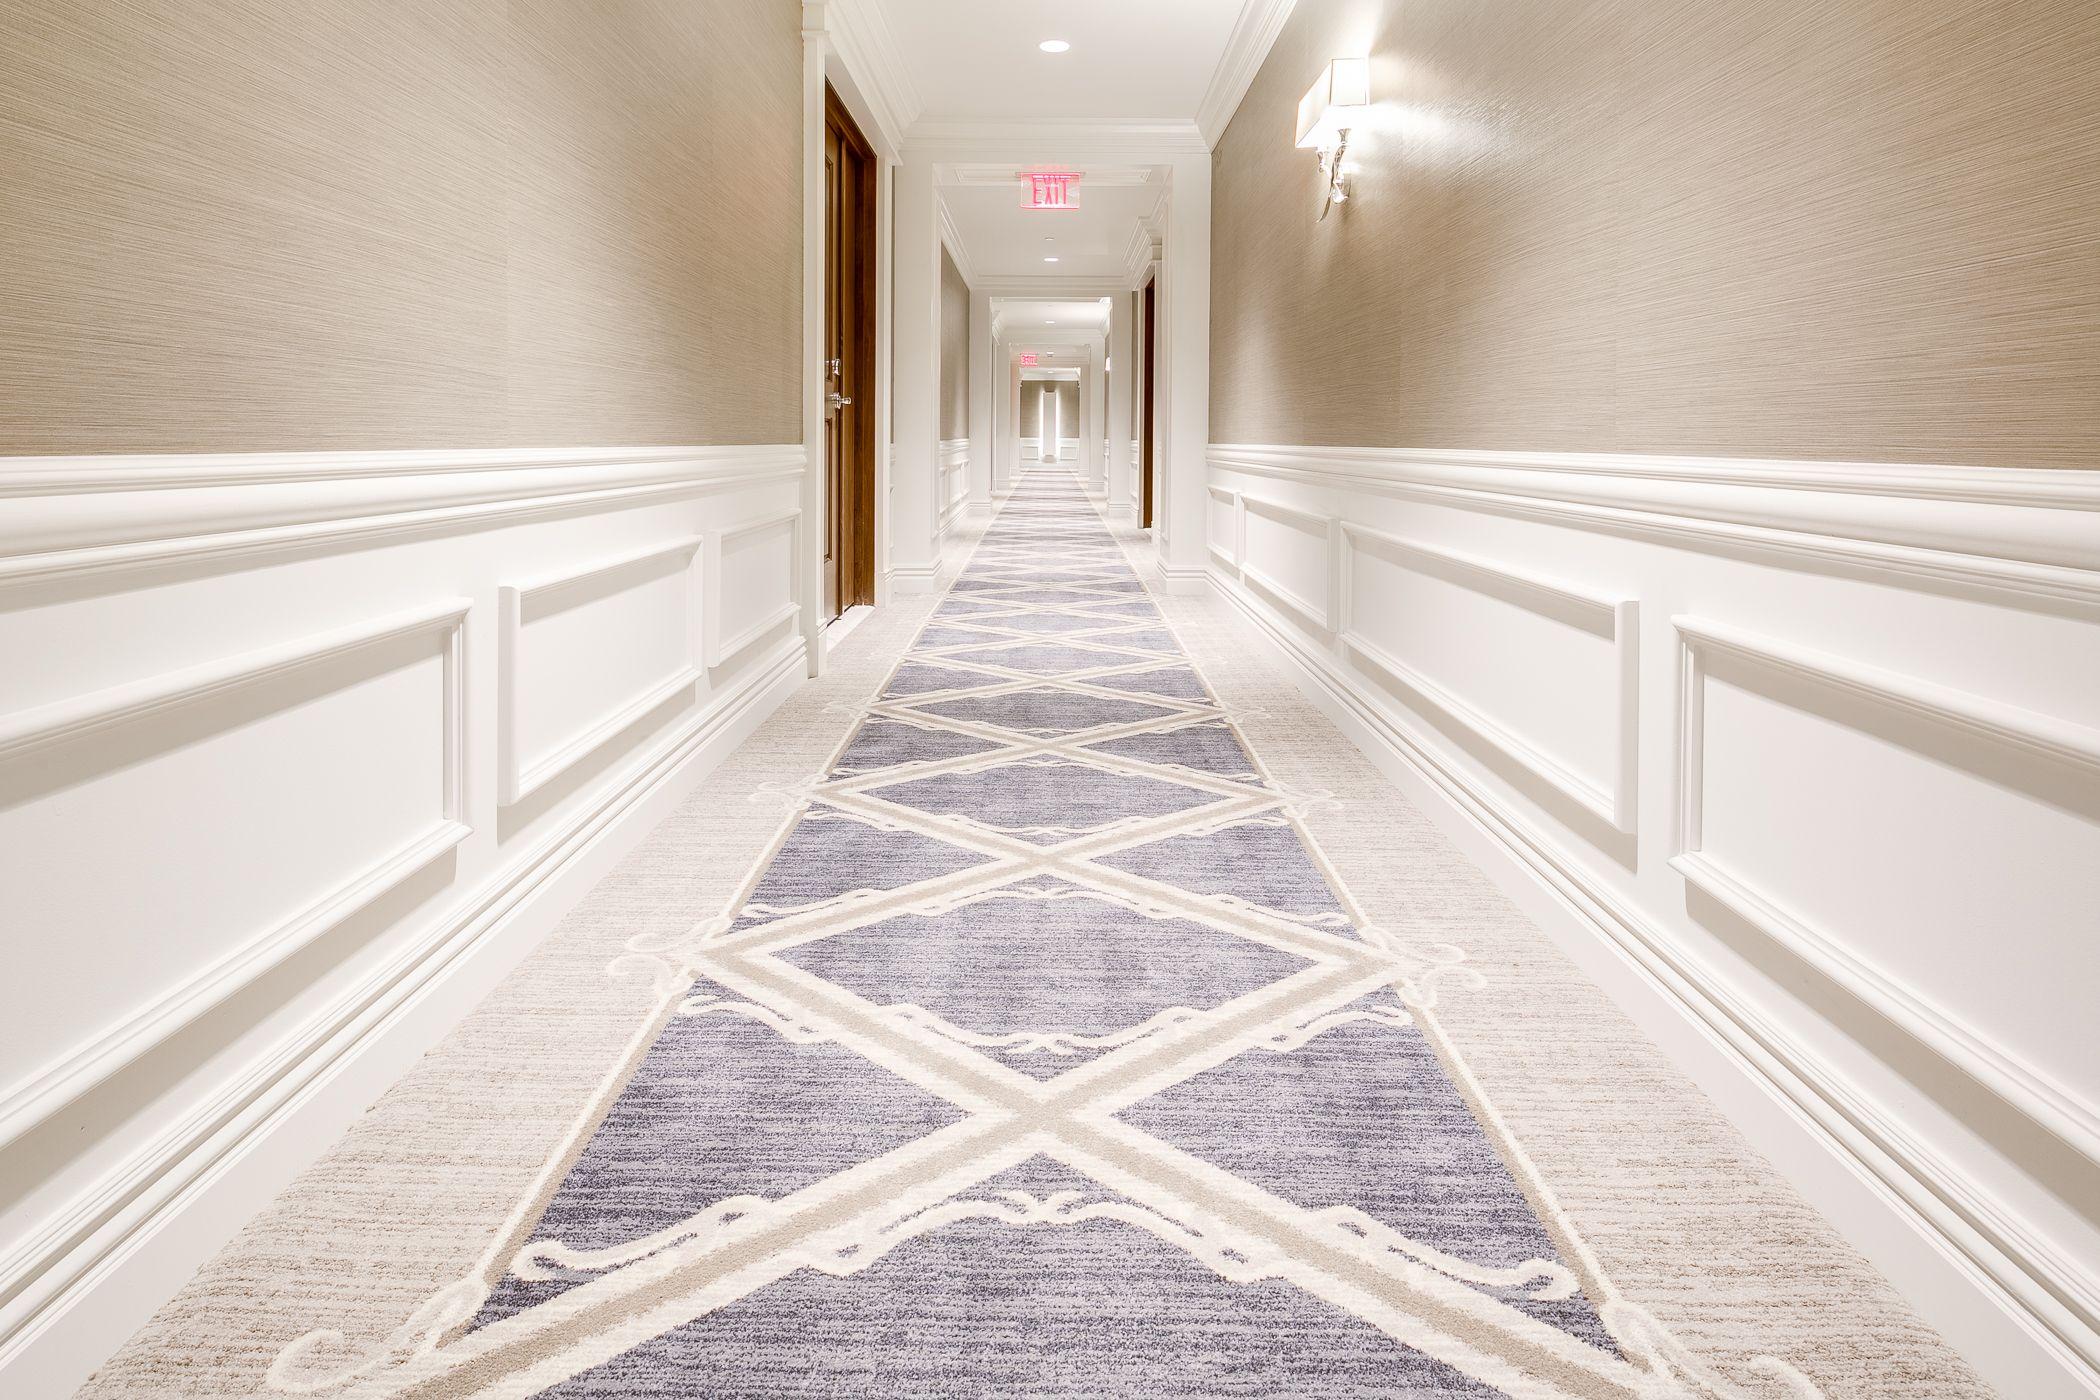 Hallway - Carpet